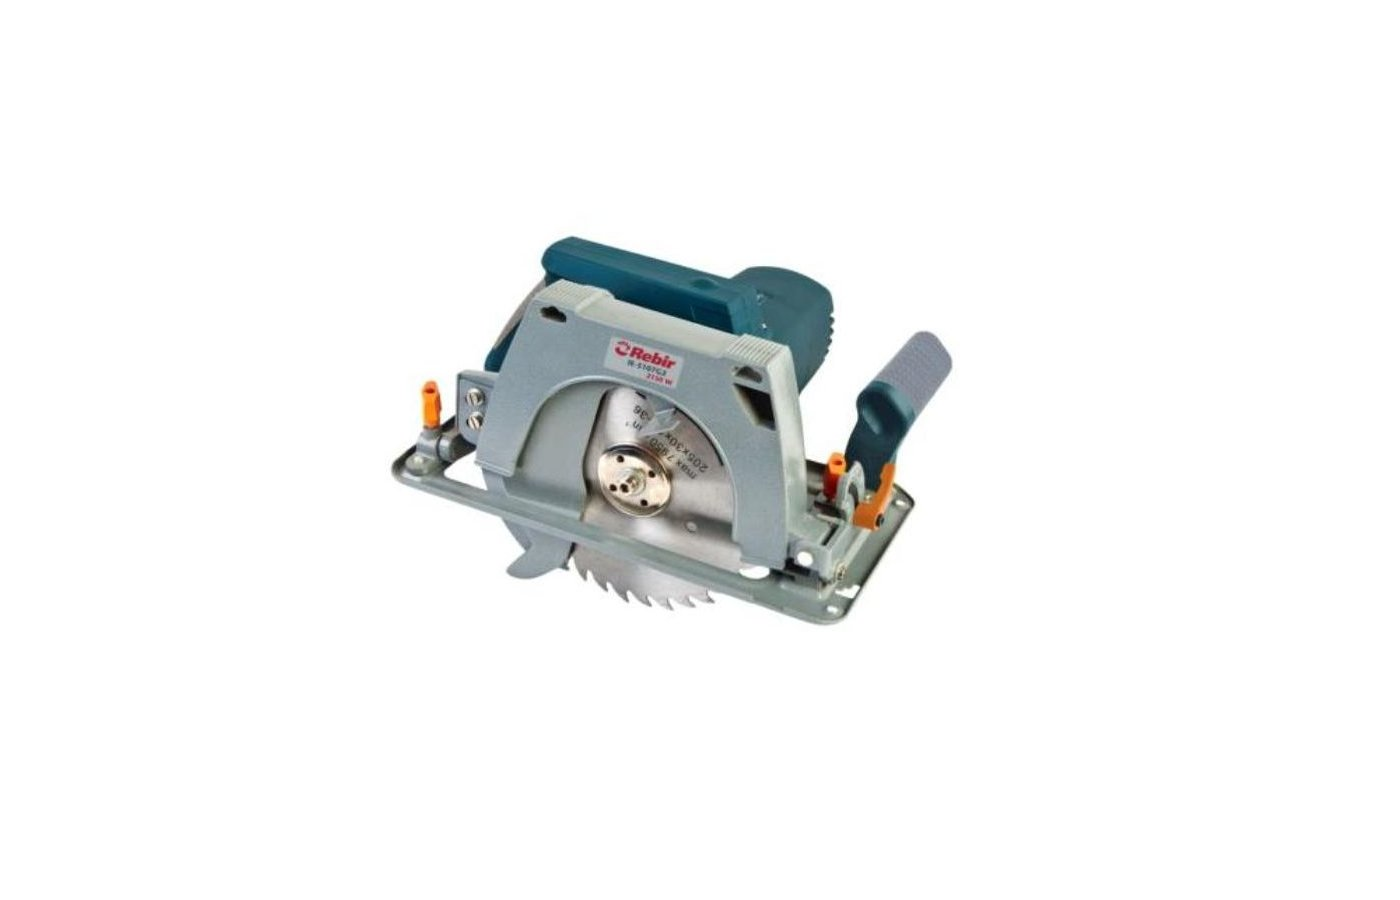 Электропила дисковая Rebir IE 5107G3